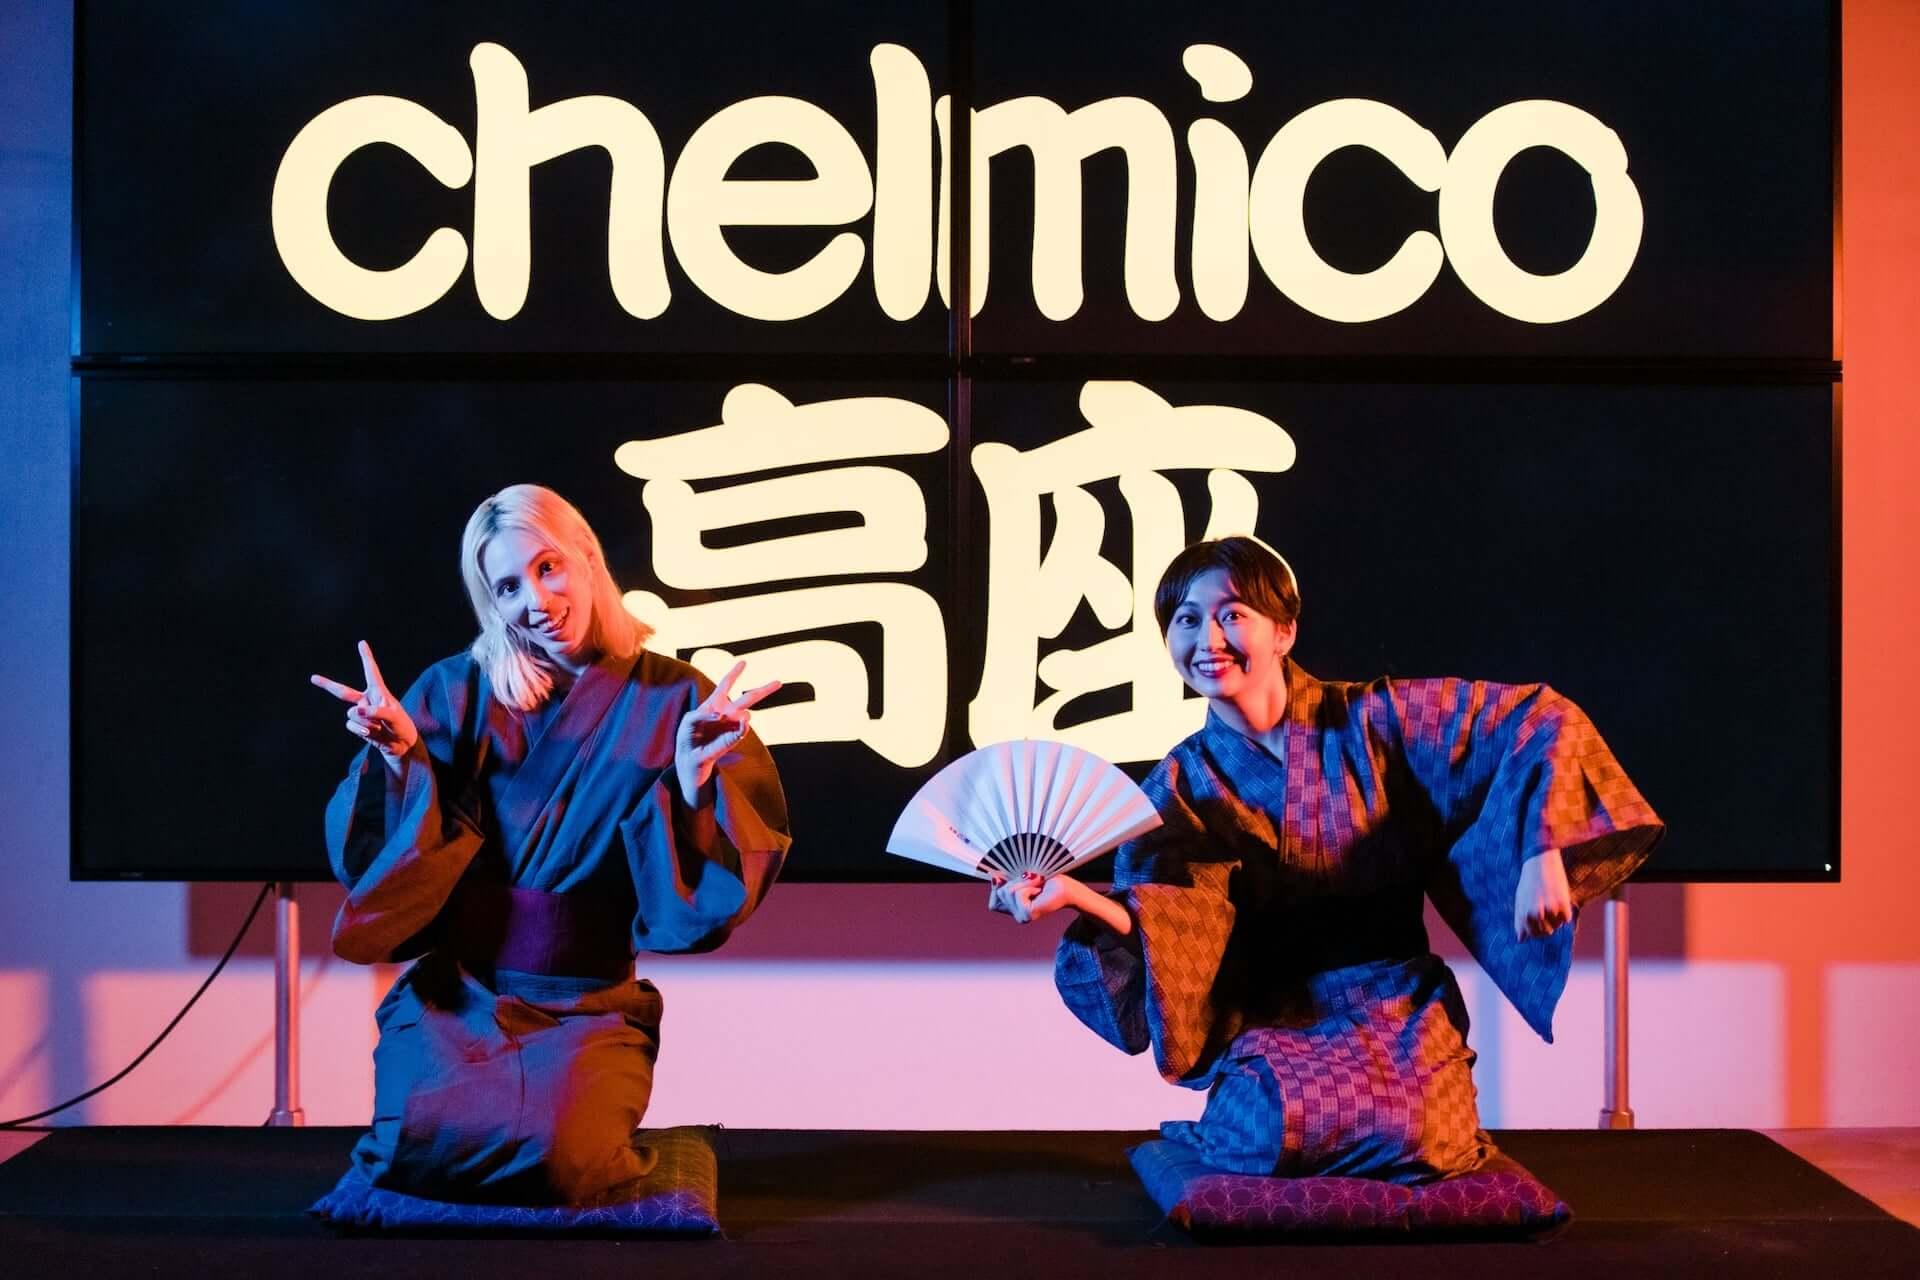 chelmicoが怪談&落語に初挑戦!『maze』リリース記念特番がスペシャで放送決定 バナナマン、トンツカタン、大童澄瞳も出演 music200818_chelmico_2-1920x1280